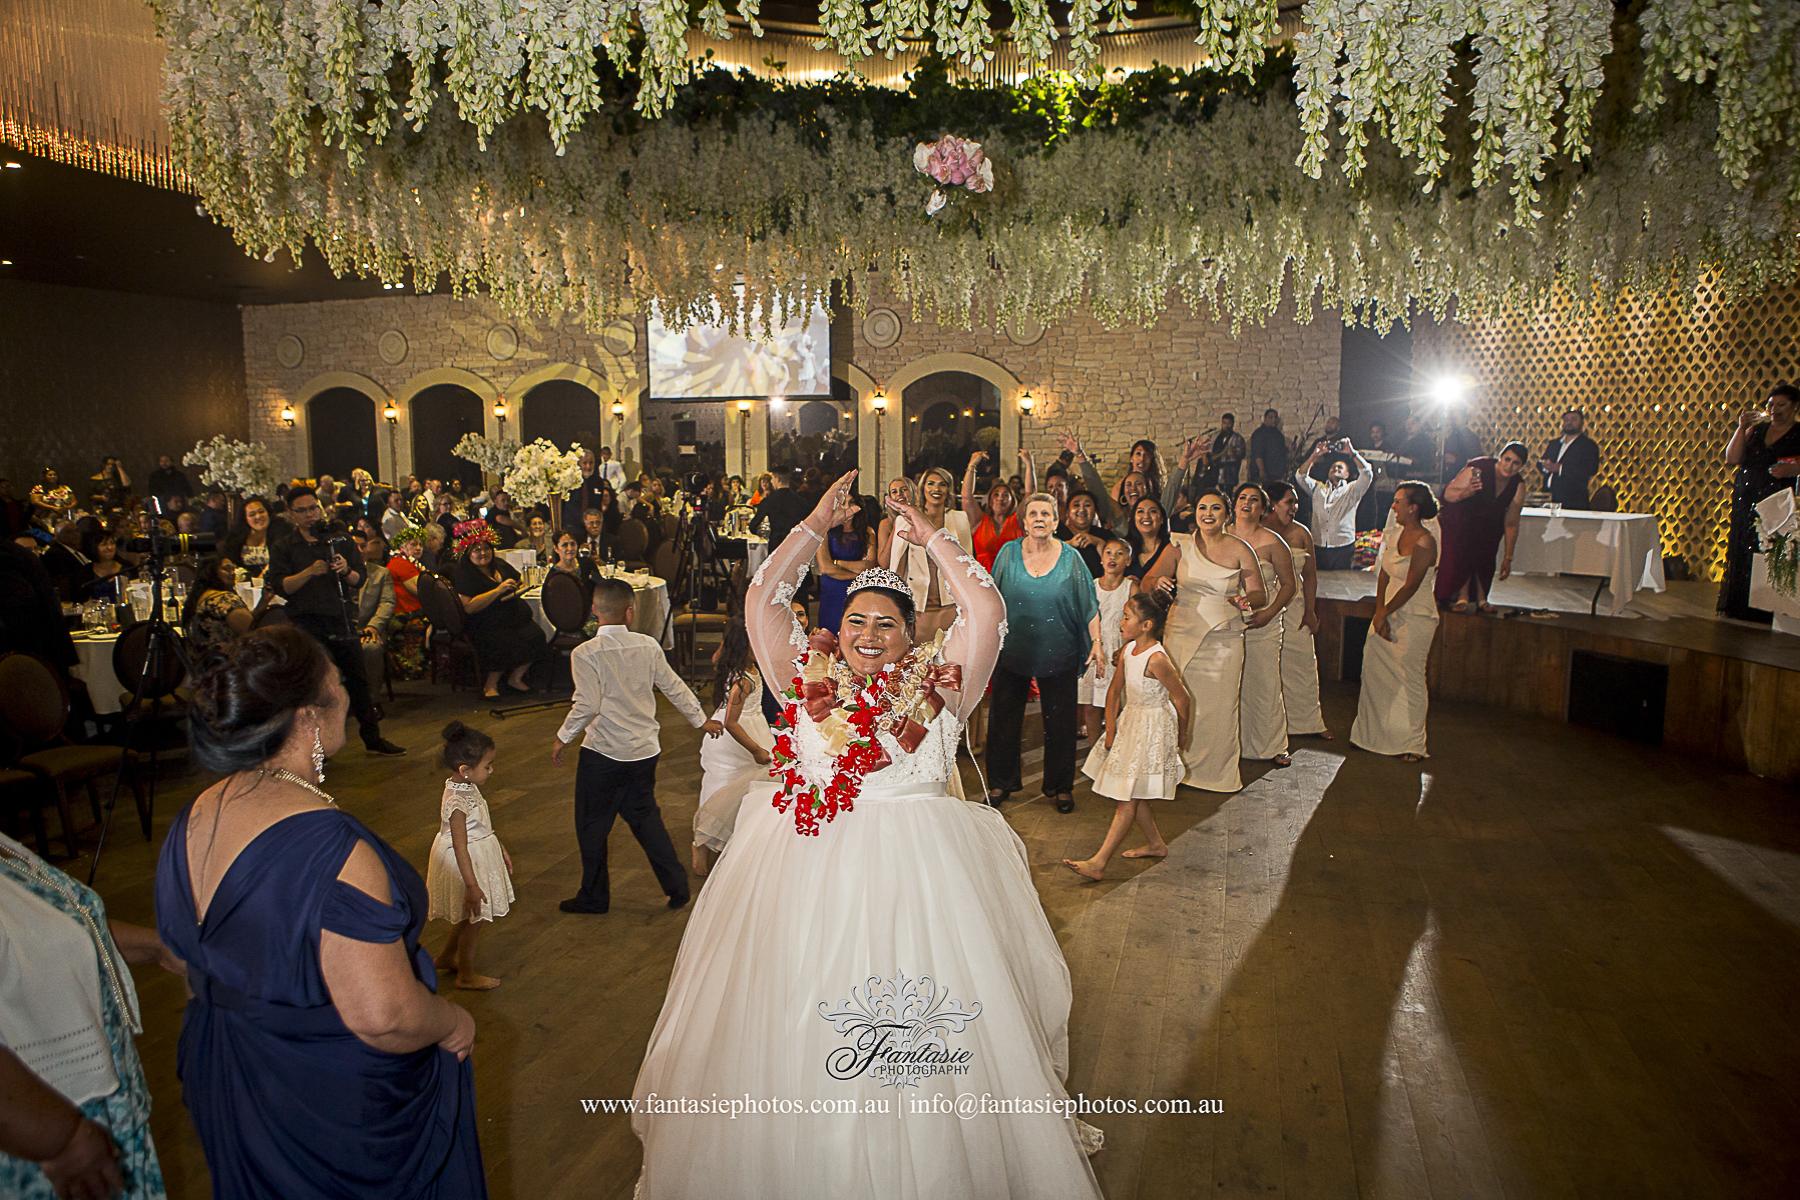 Wedding Photography at Wedding Reception at Lemnos Club | Fantasie Photography